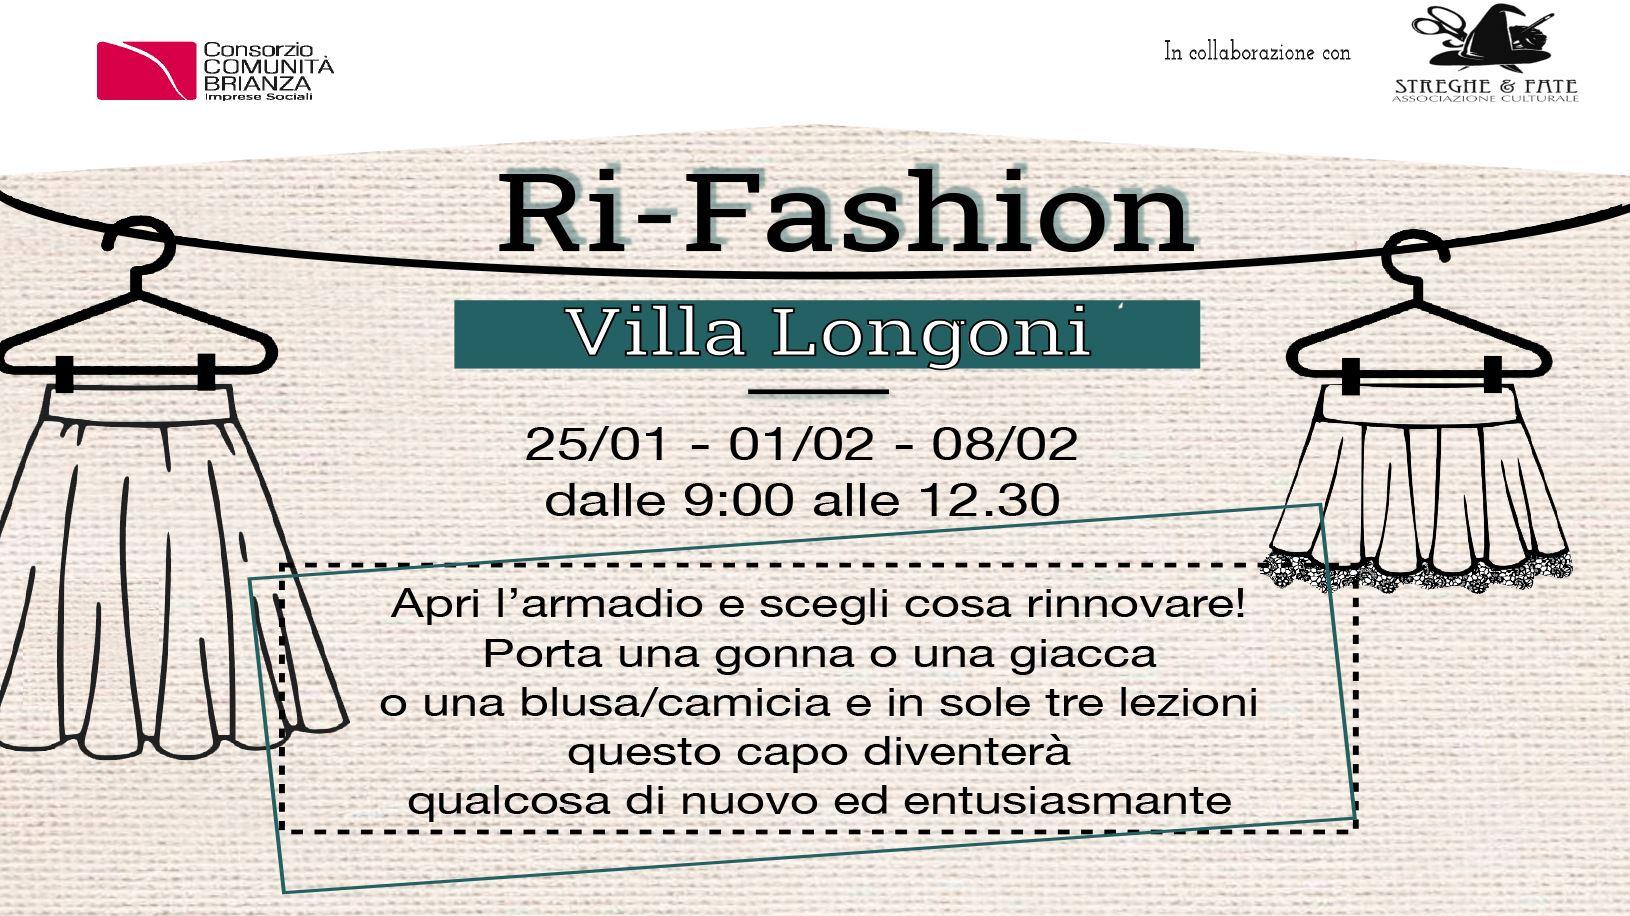 Corsi di ri-fashion a Villa Longoni